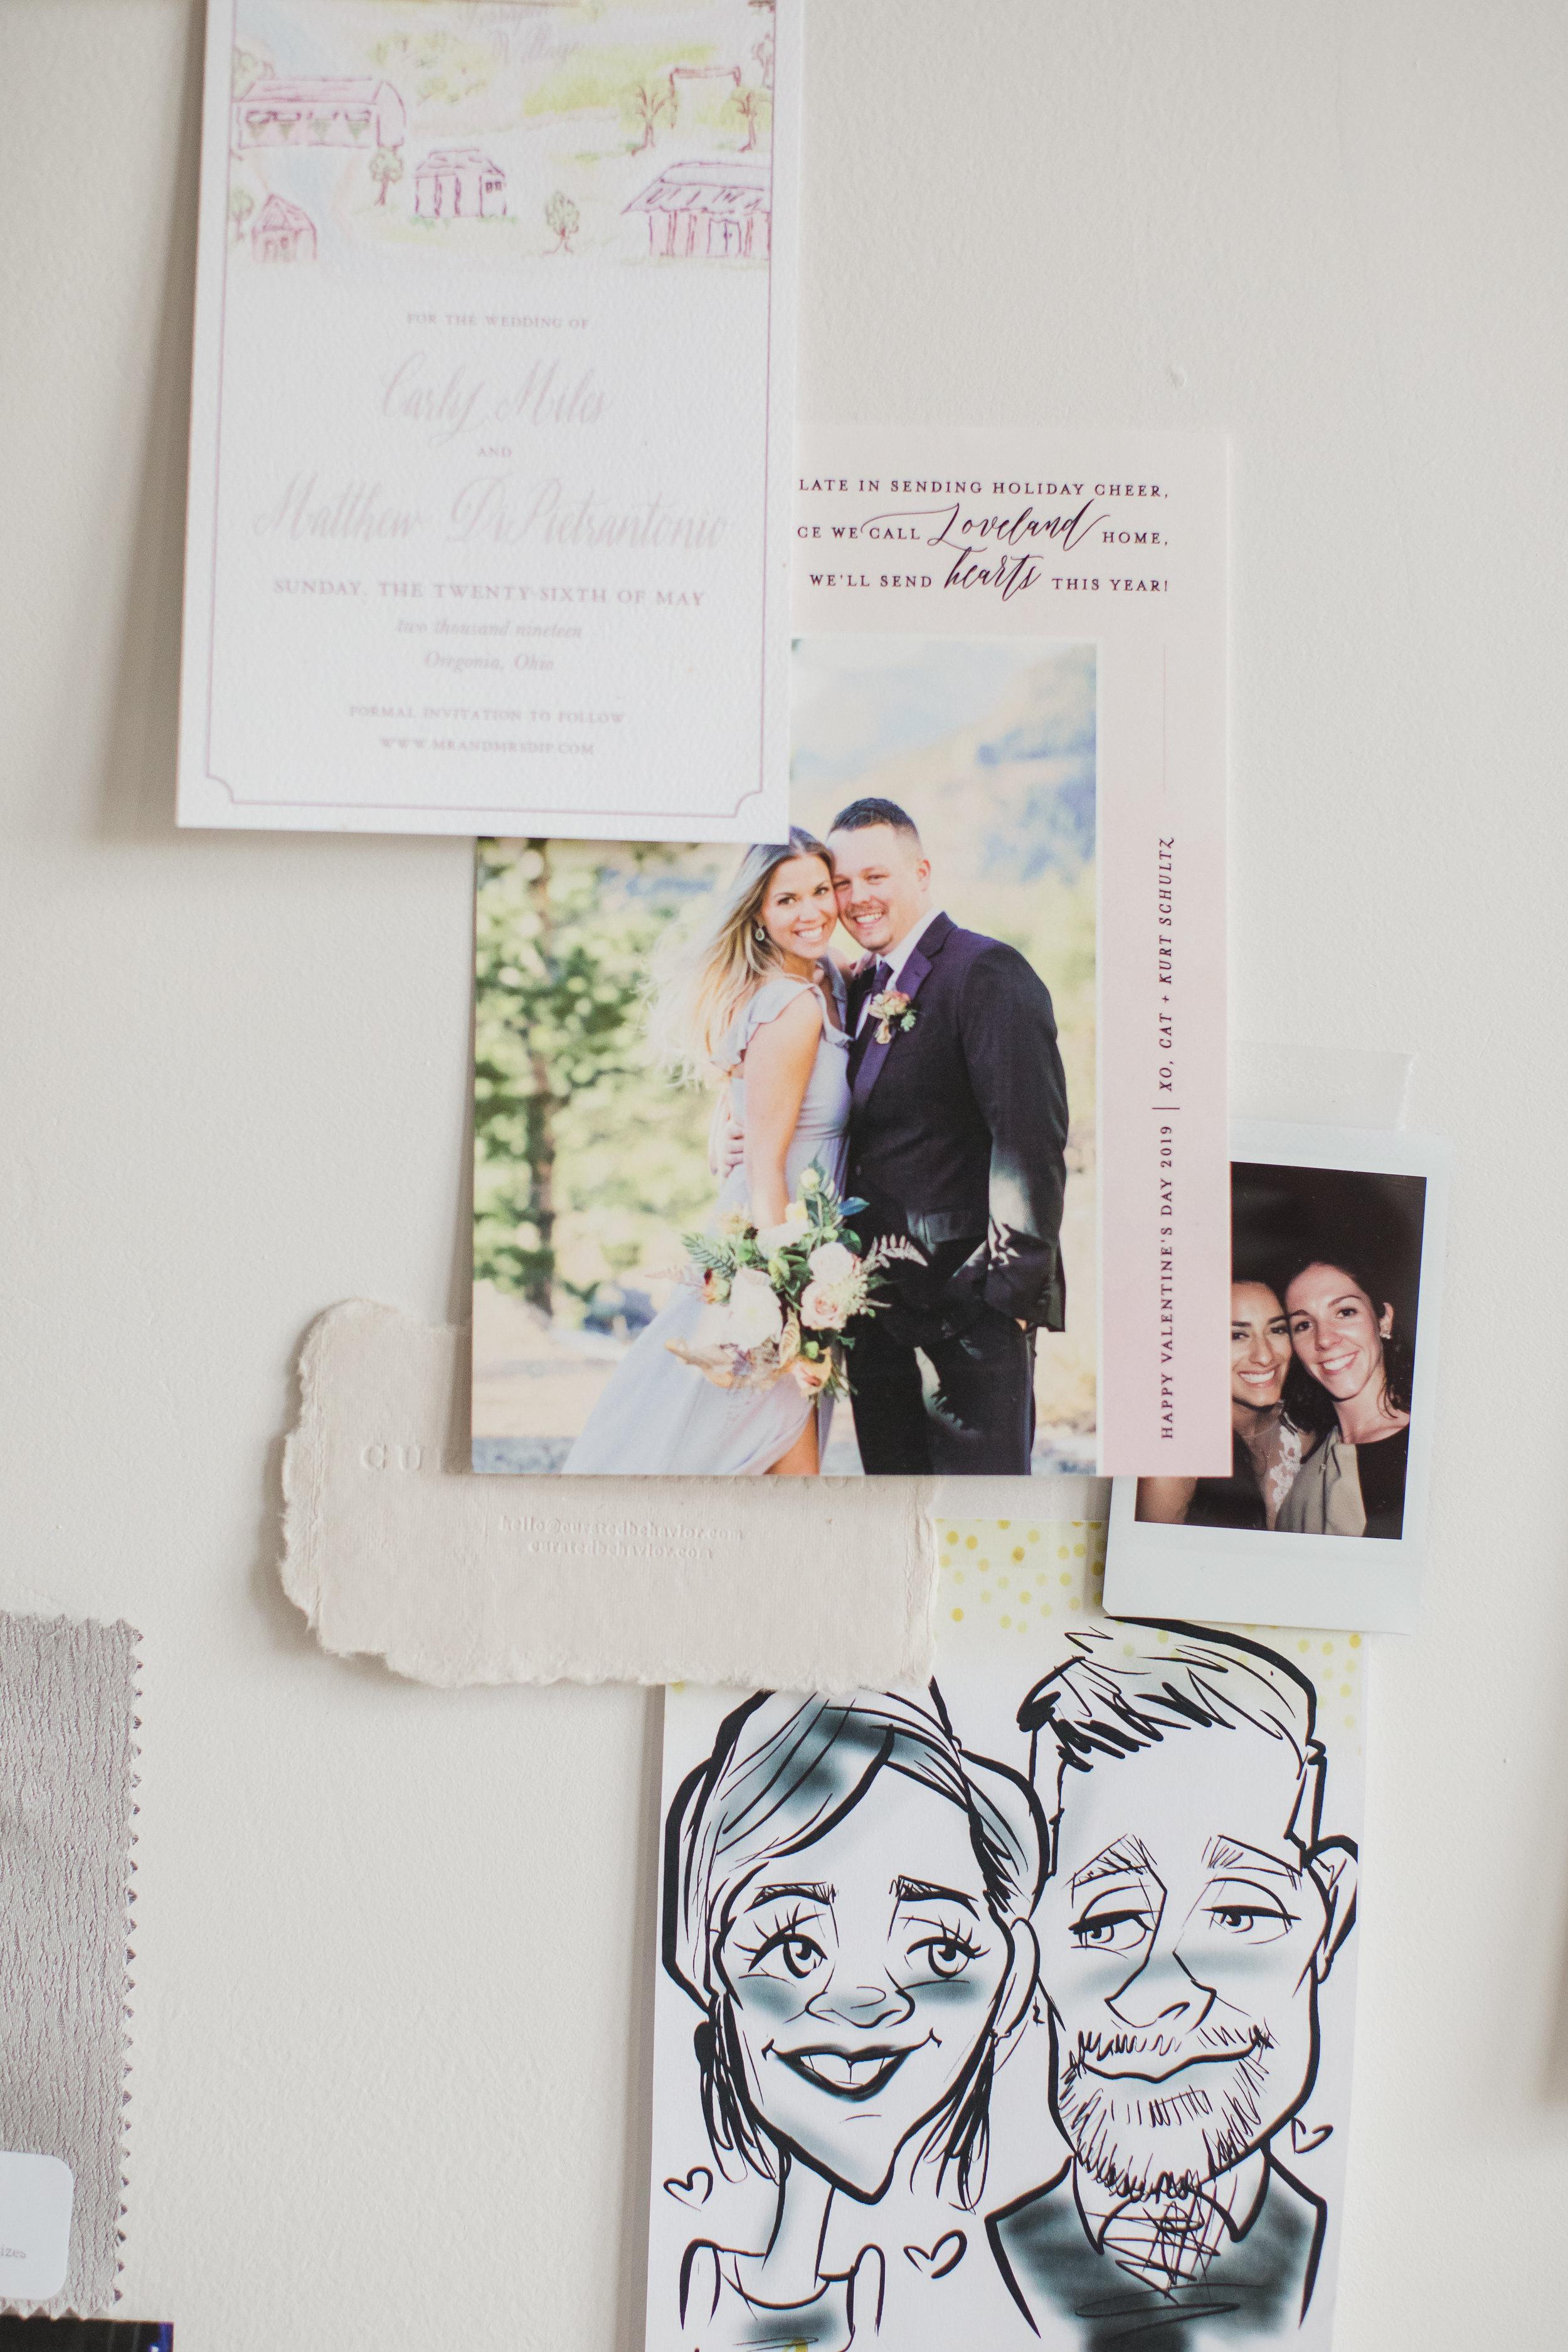 Samantha-Joy-Events-design-wall-inspiration-wedding-planner-dayton-ohio